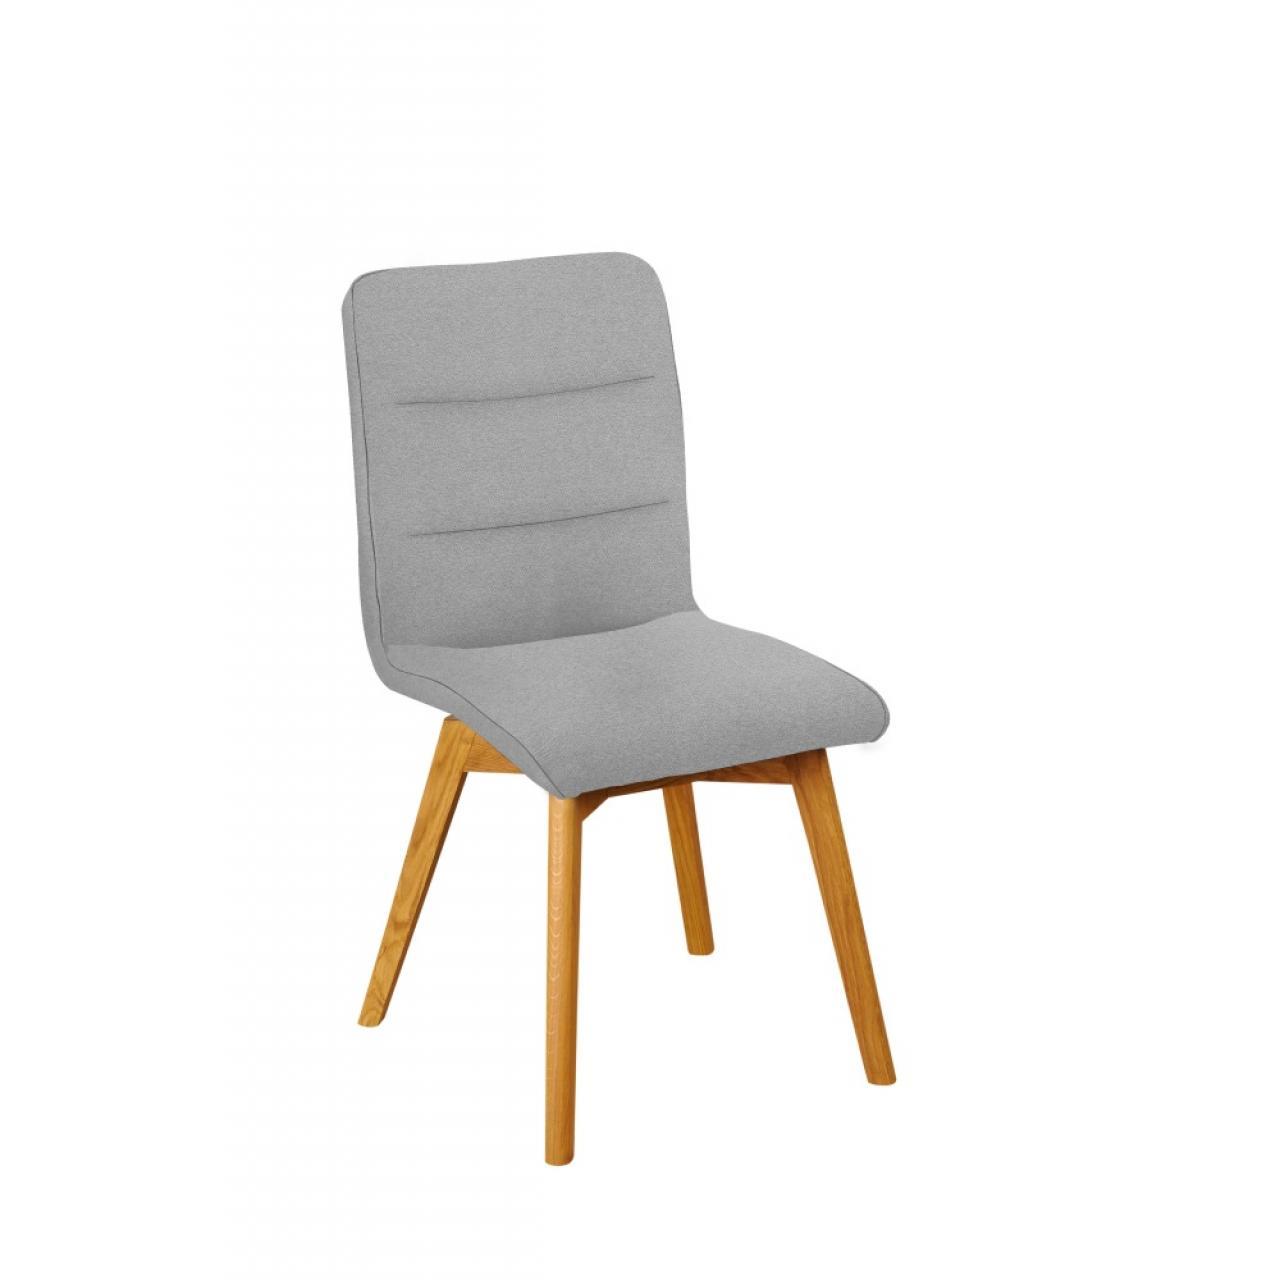 Stuhl 106 E6 Esszimmer Küche Küchenstuhl Stoff Massivholz